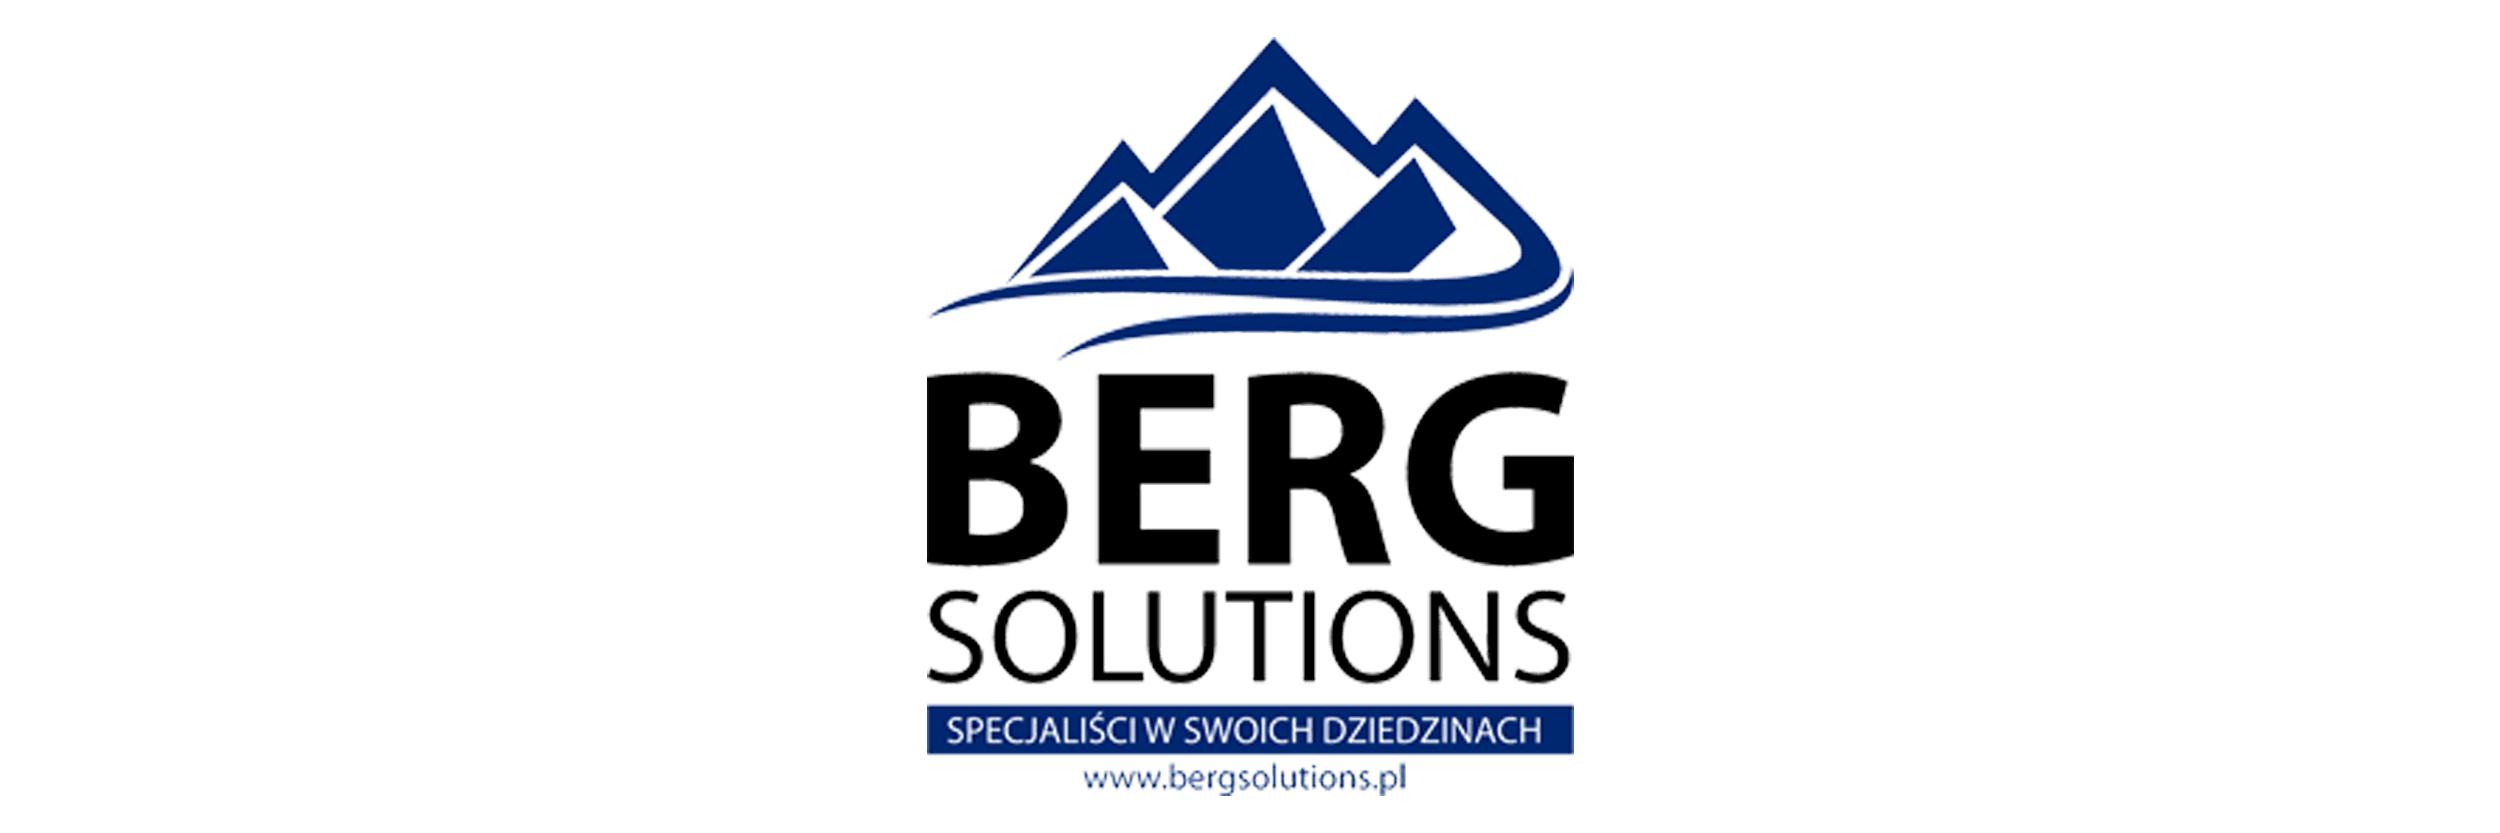 14_Berg solutions